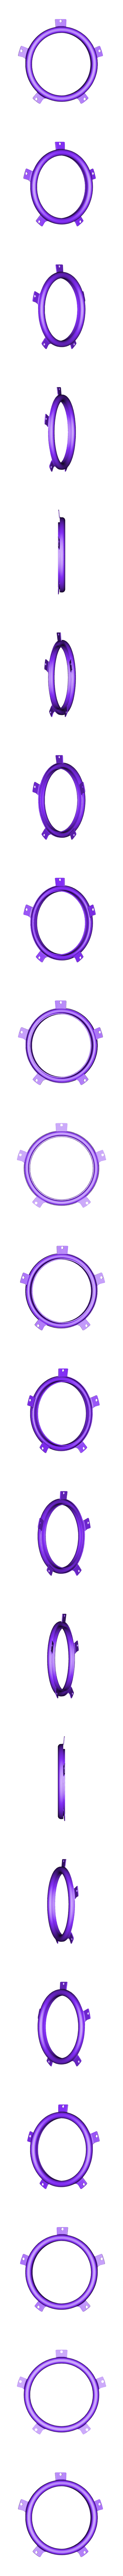 Lucio_frontDiffuser.stl Download free STL file Overwatch Lucio Blaster • 3D printer object, Adafruit